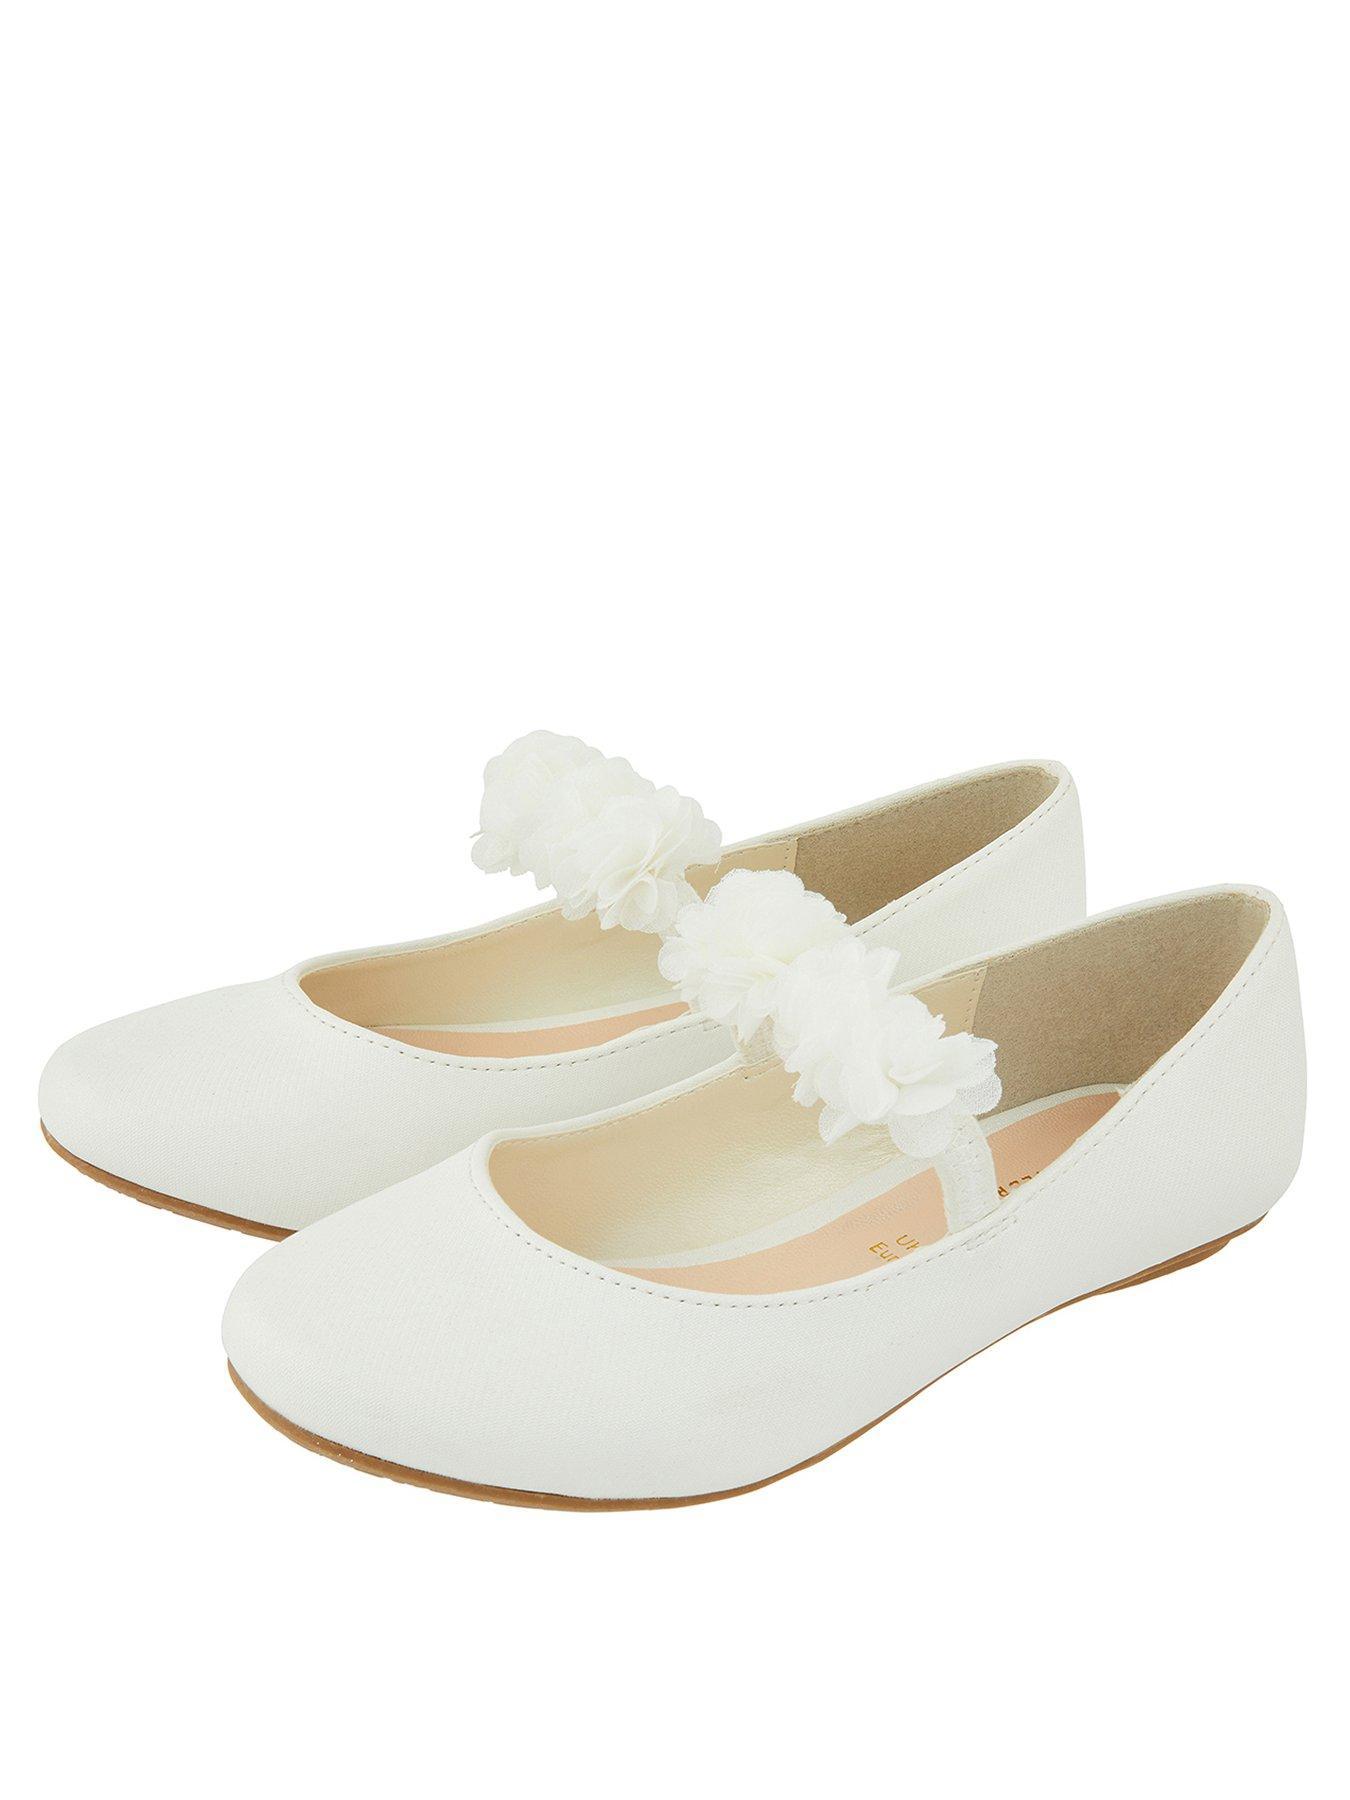 Monsoon | Shoes \u0026 boots | Child \u0026 baby